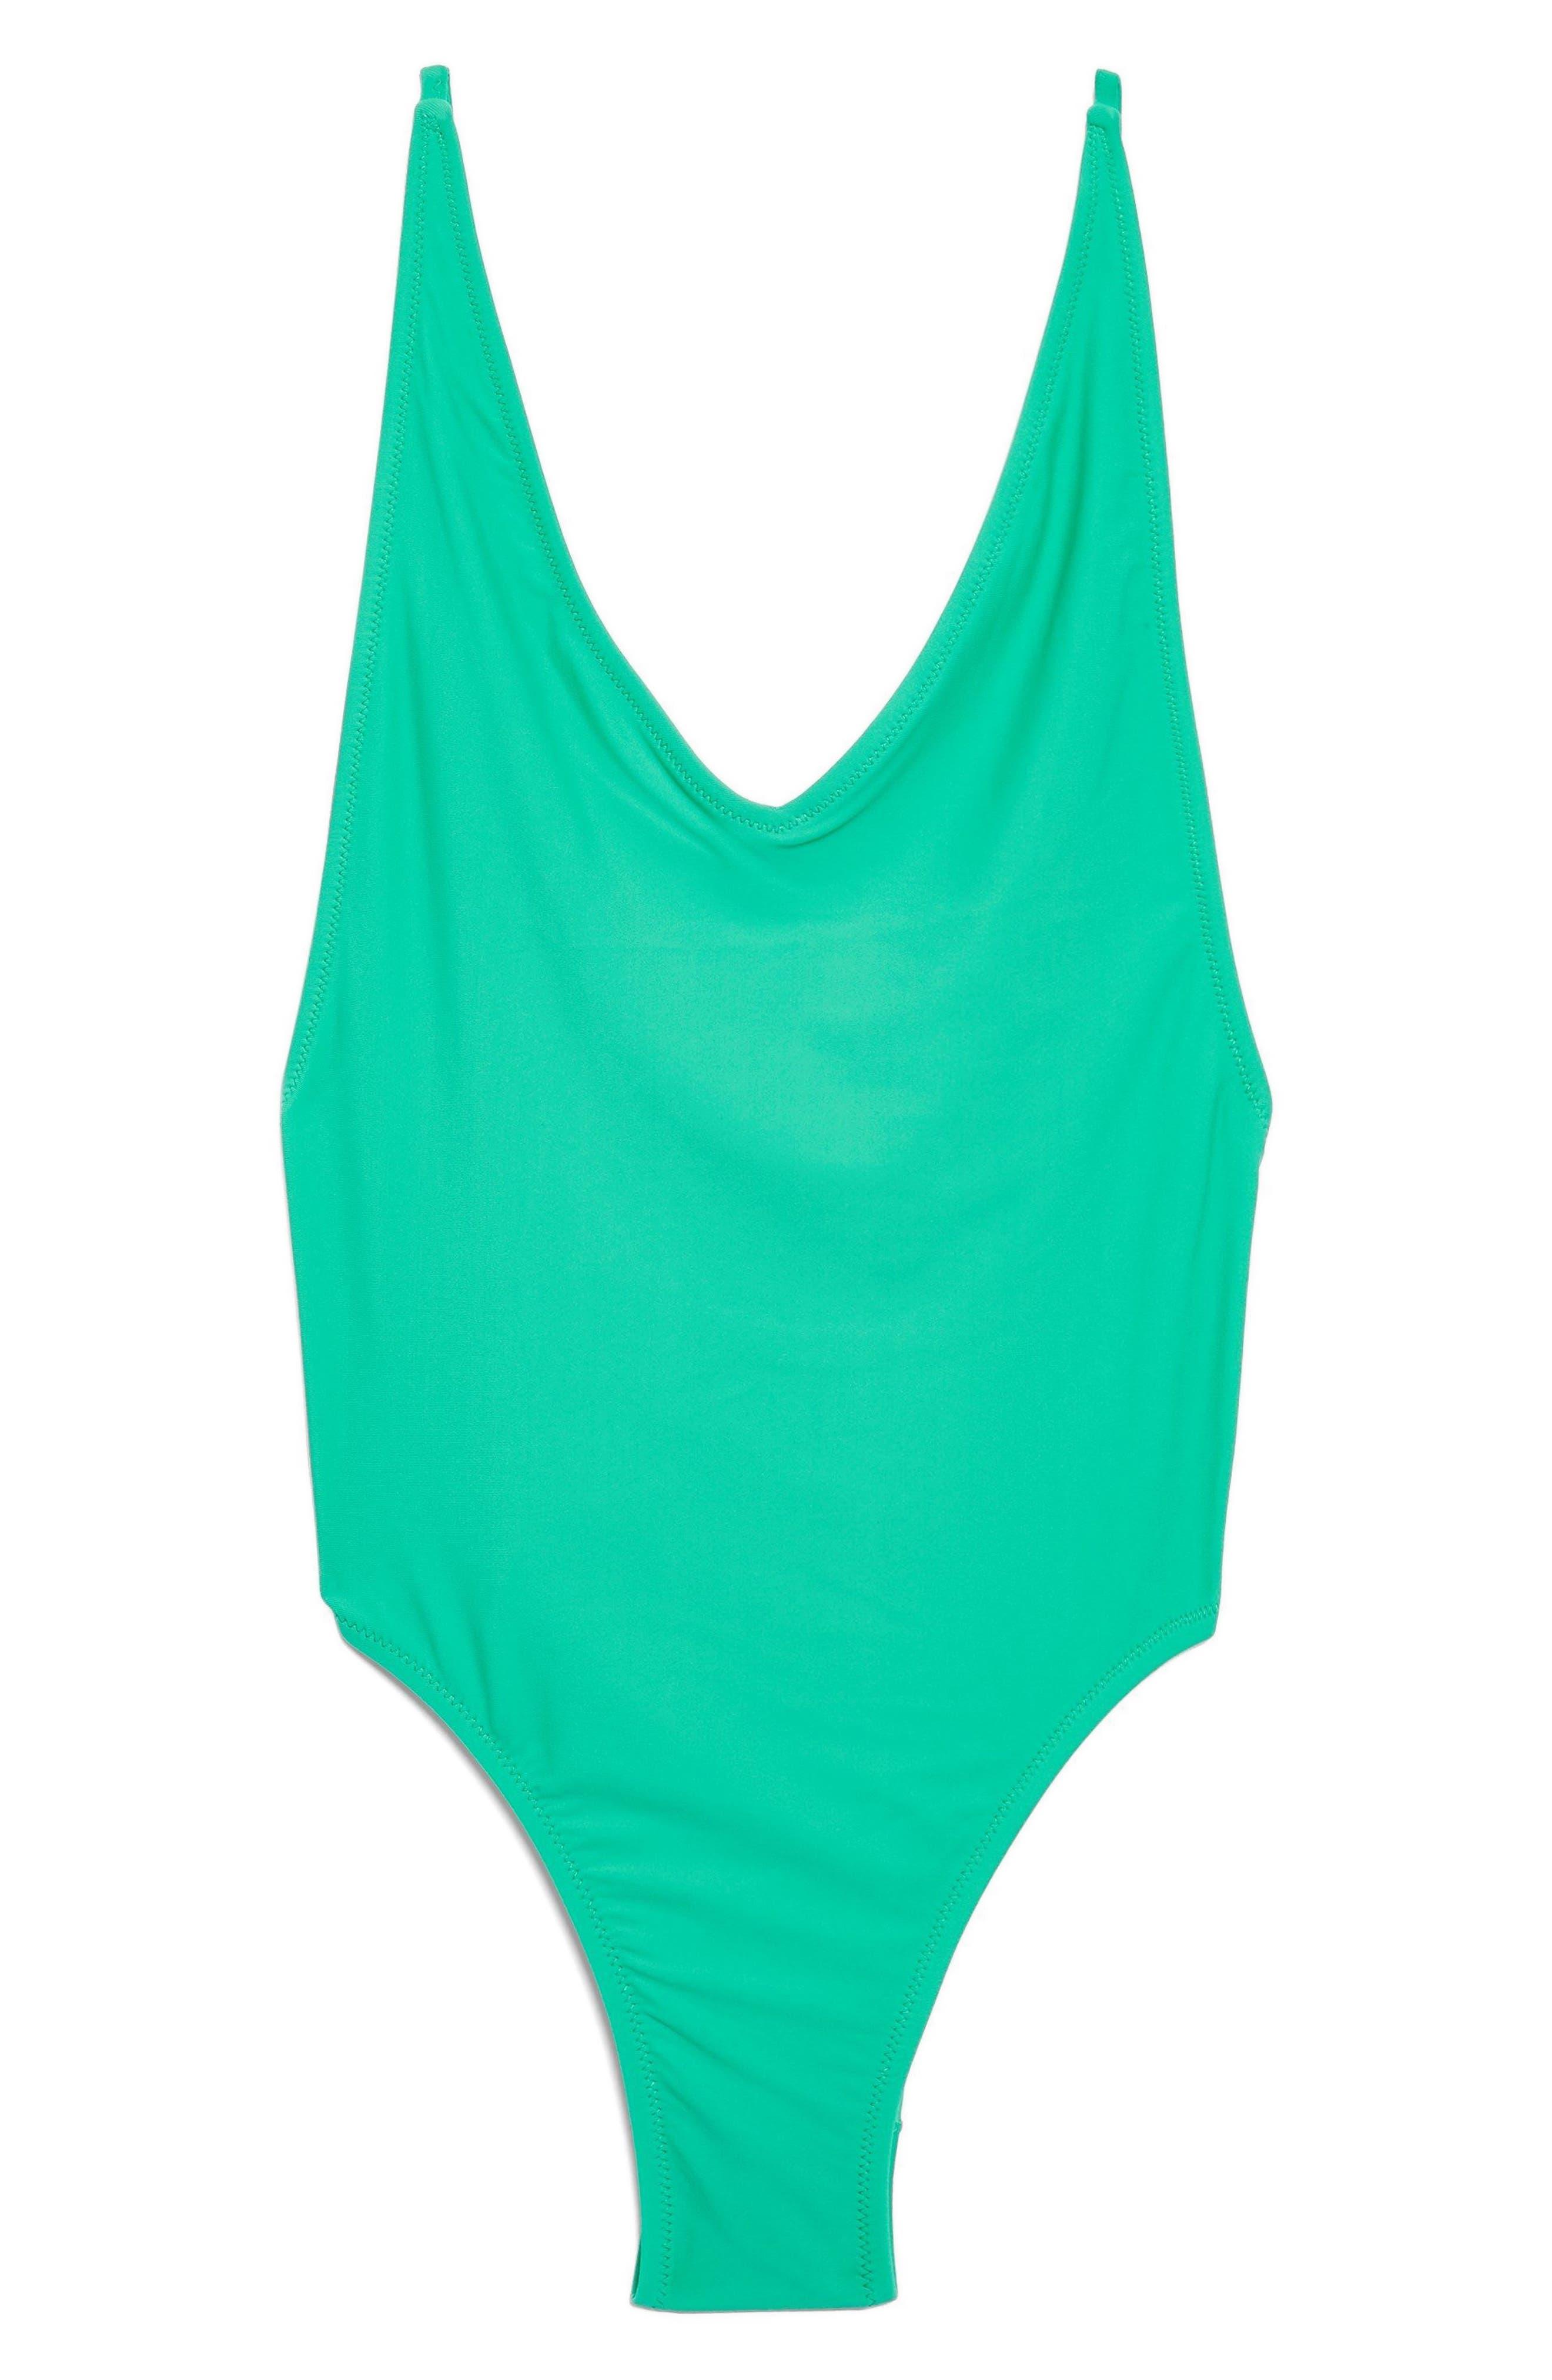 Pamela One-Piece Swimsuit,                             Alternate thumbnail 4, color,                             TEAL